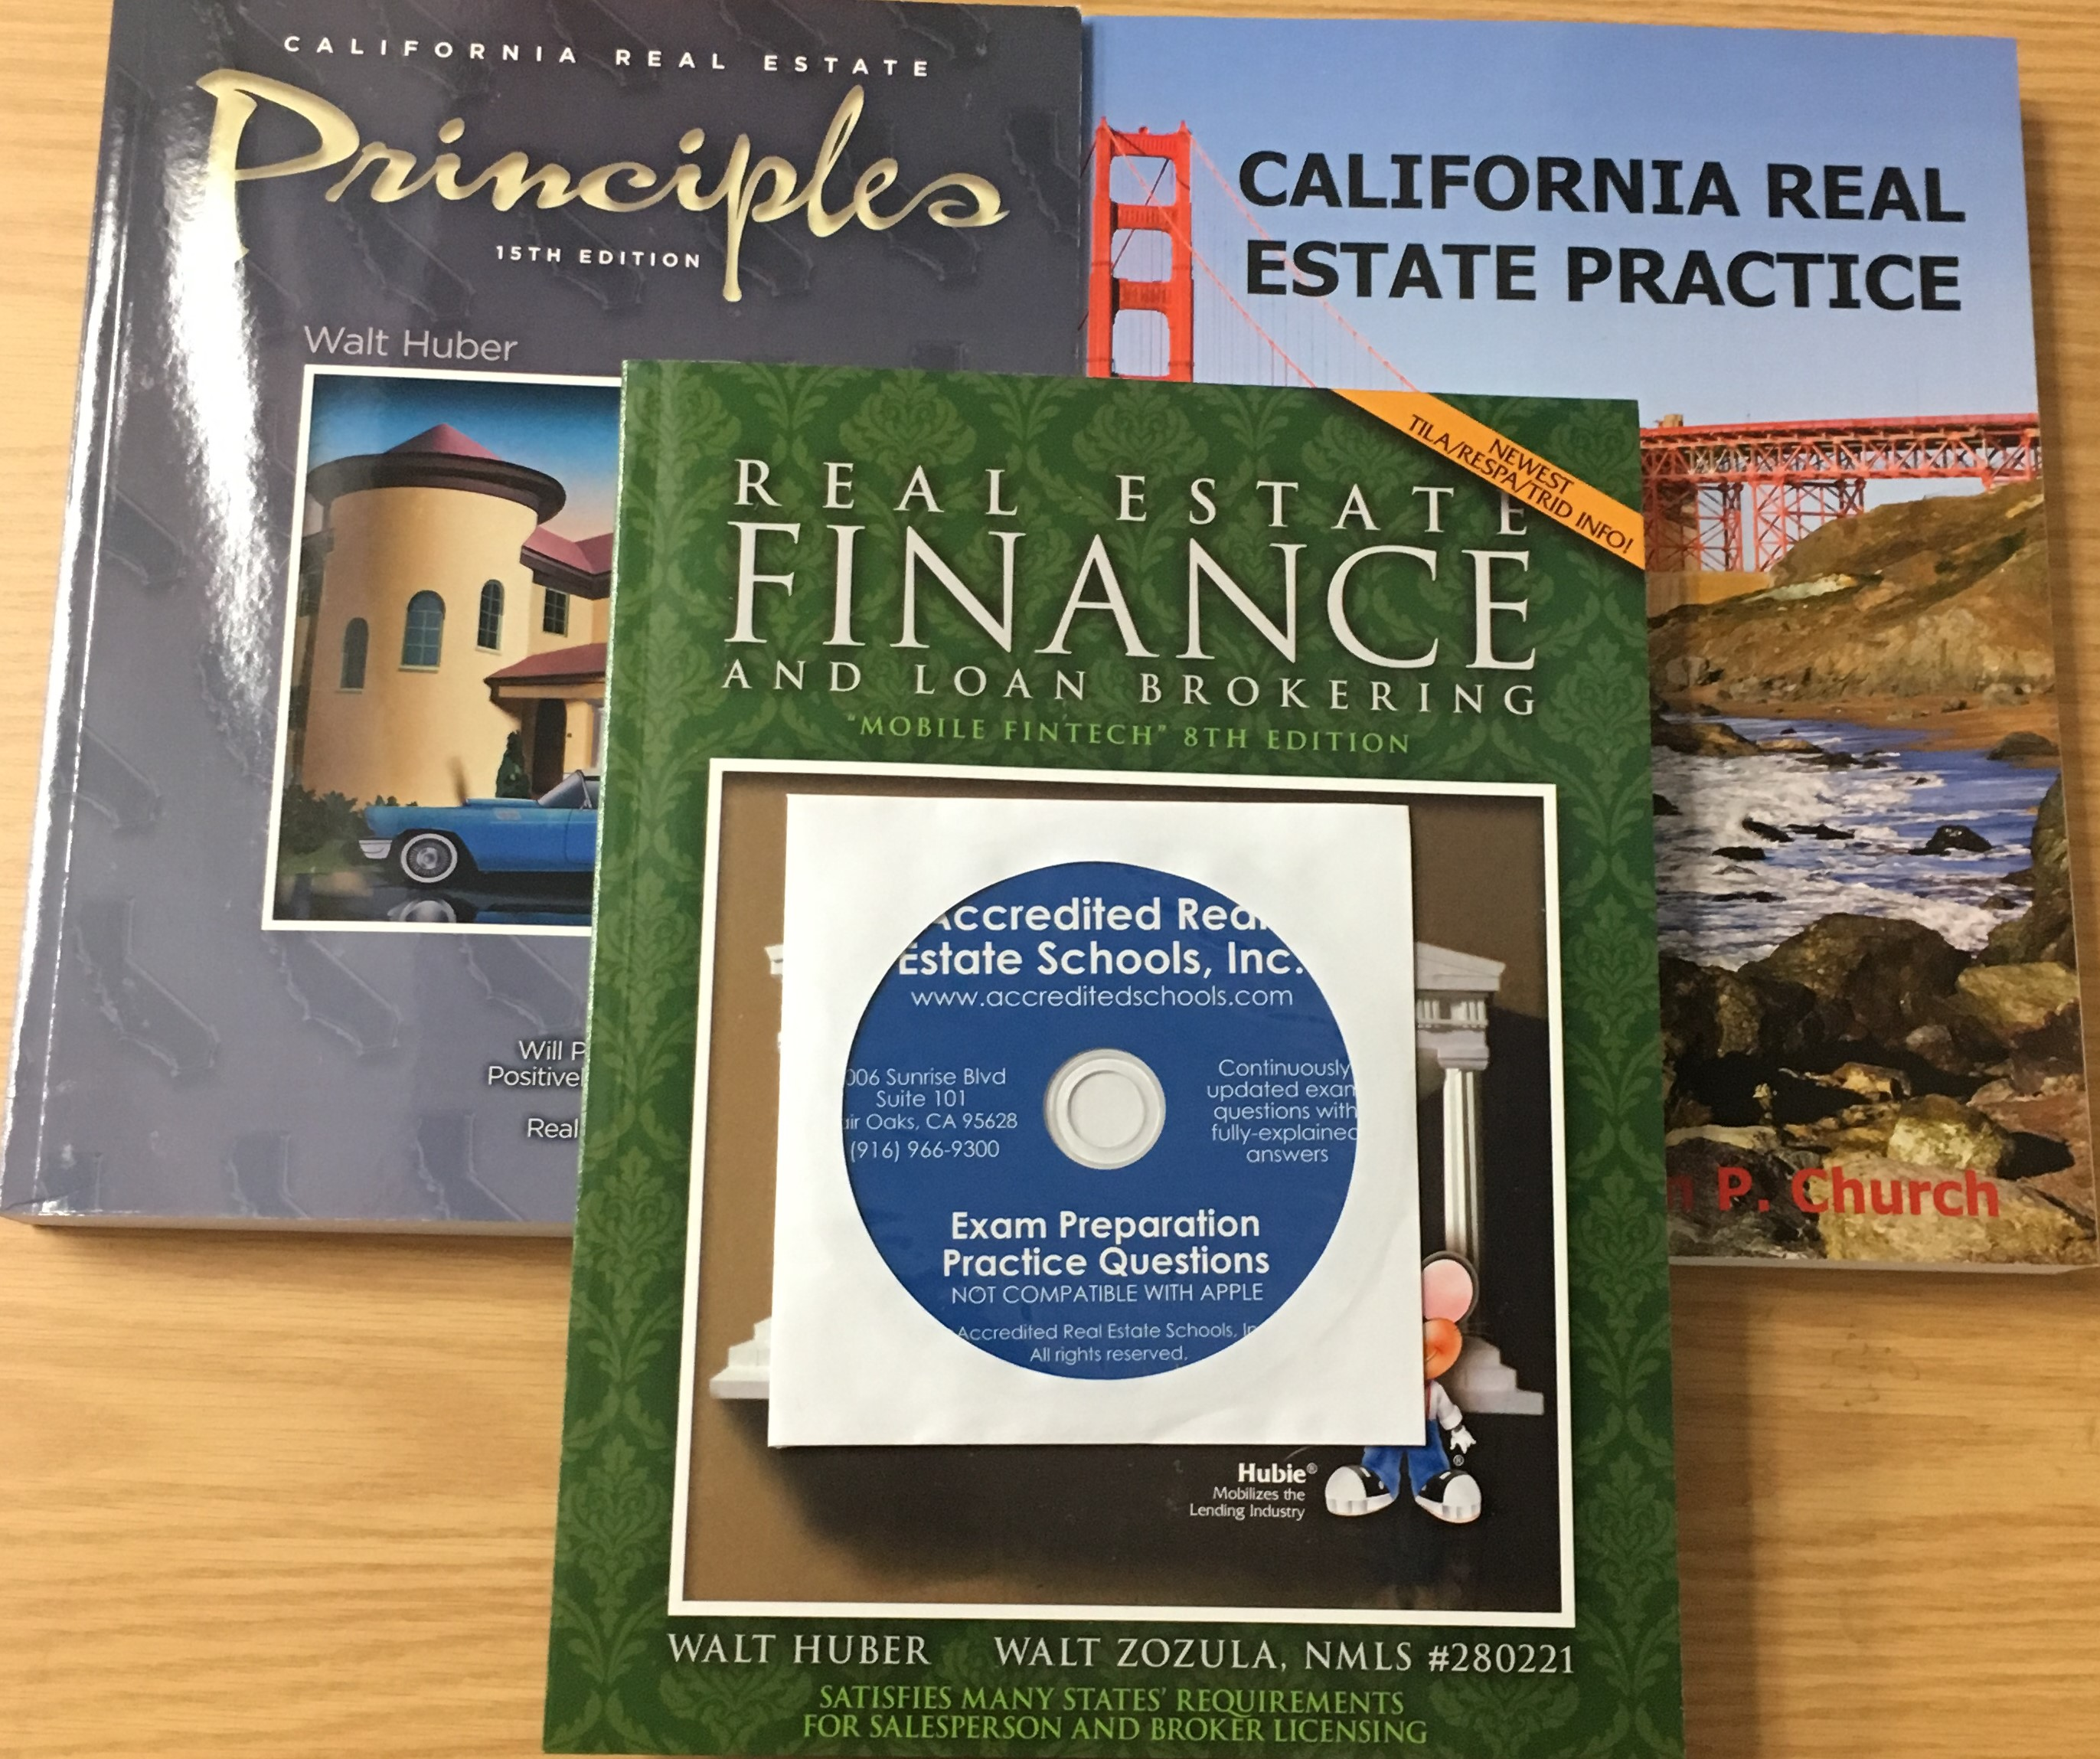 Accredited Real Estate Schools Inc